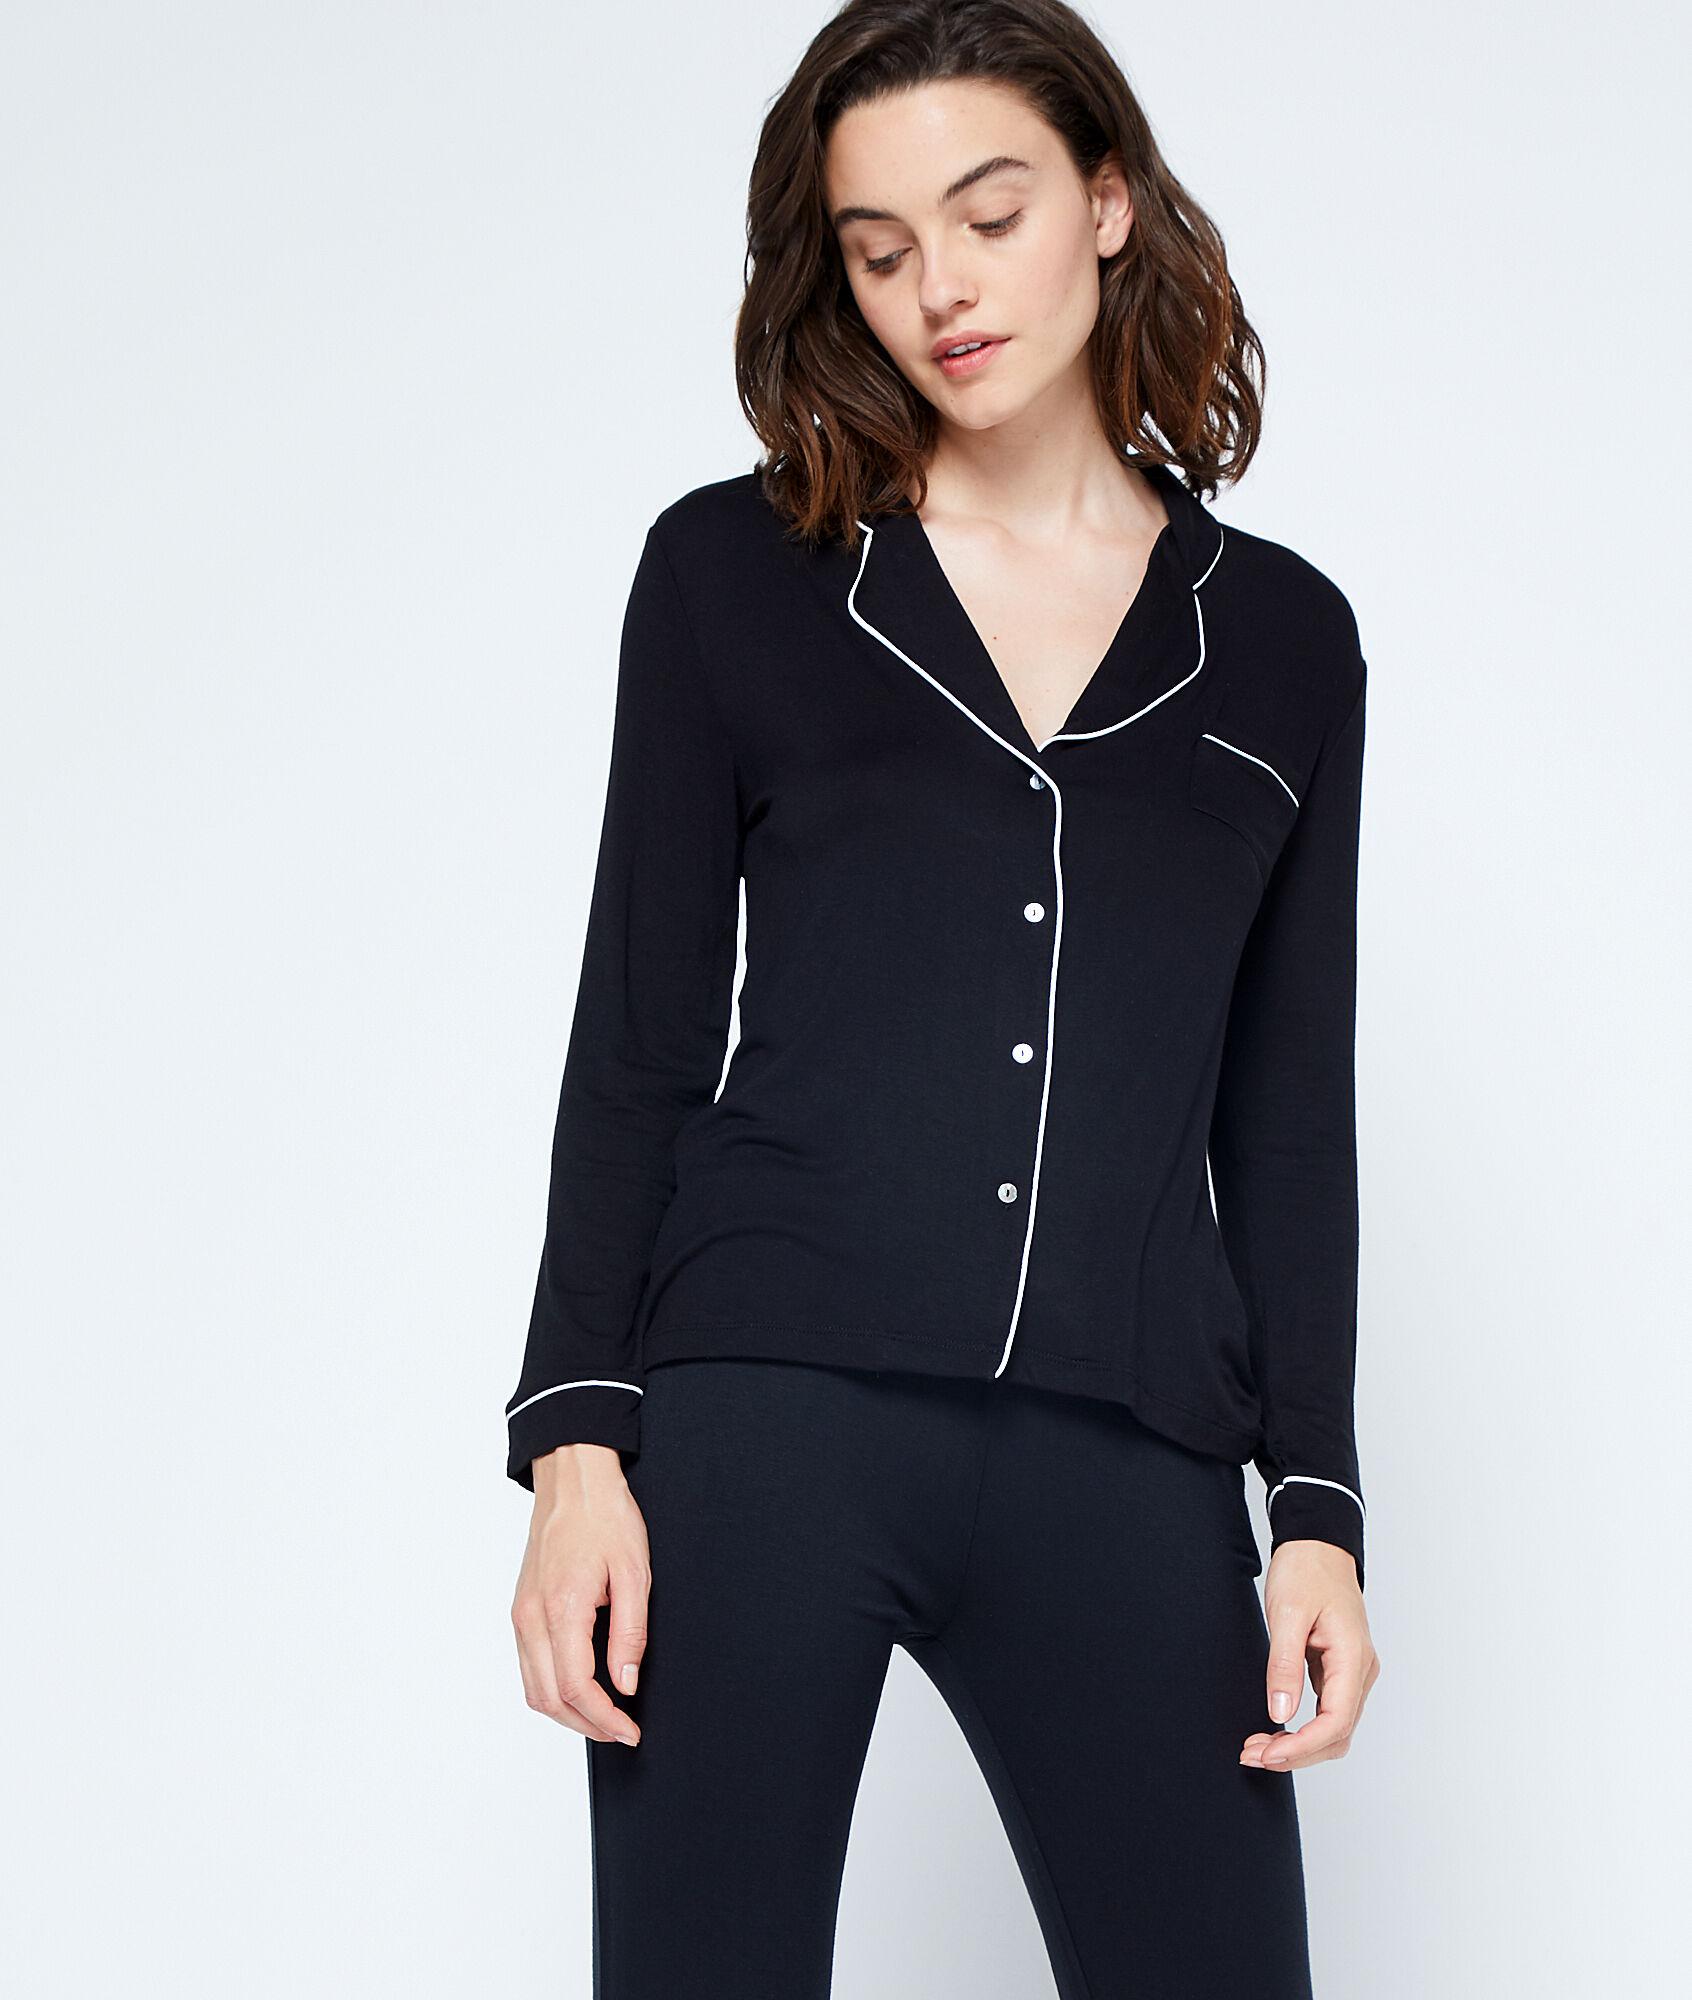 waelle chemise pyjama bicolore etam. Black Bedroom Furniture Sets. Home Design Ideas